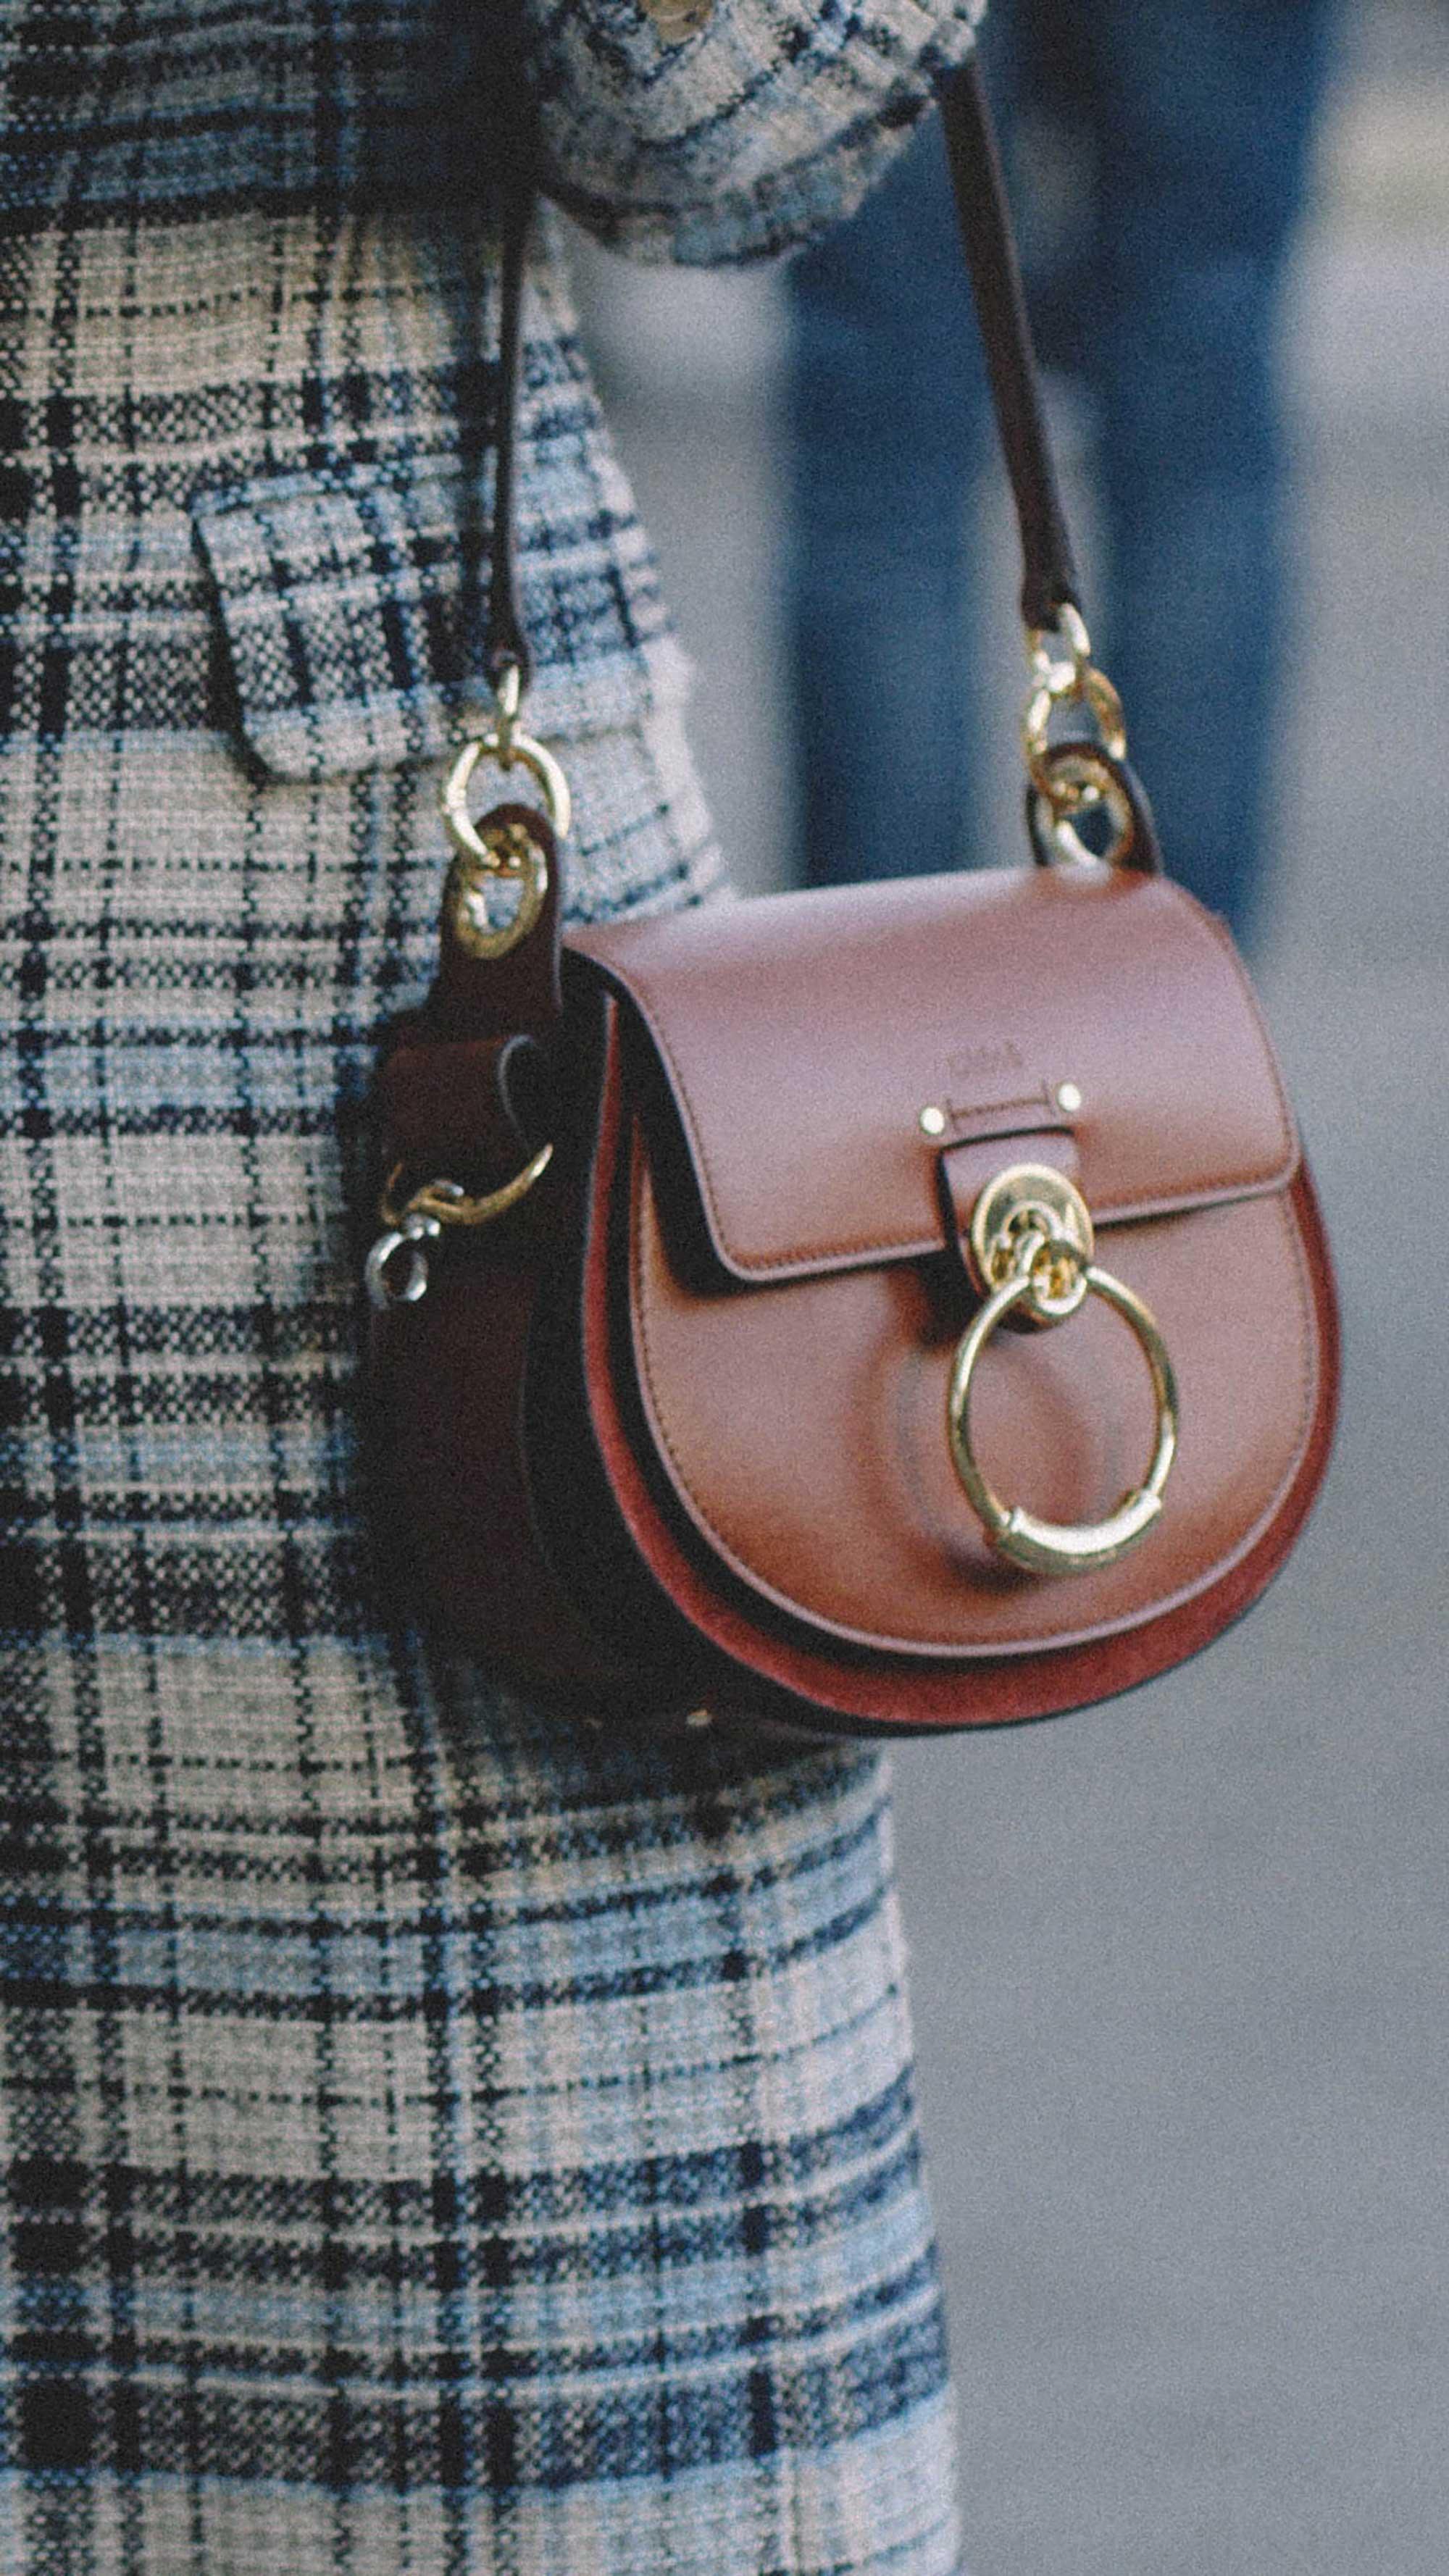 12 Best Chloe bags of Fashion Week -  CHLOe Roy mini leather bucket bag and Chloe Small Tess Leather Shoulder Bag2.jpg